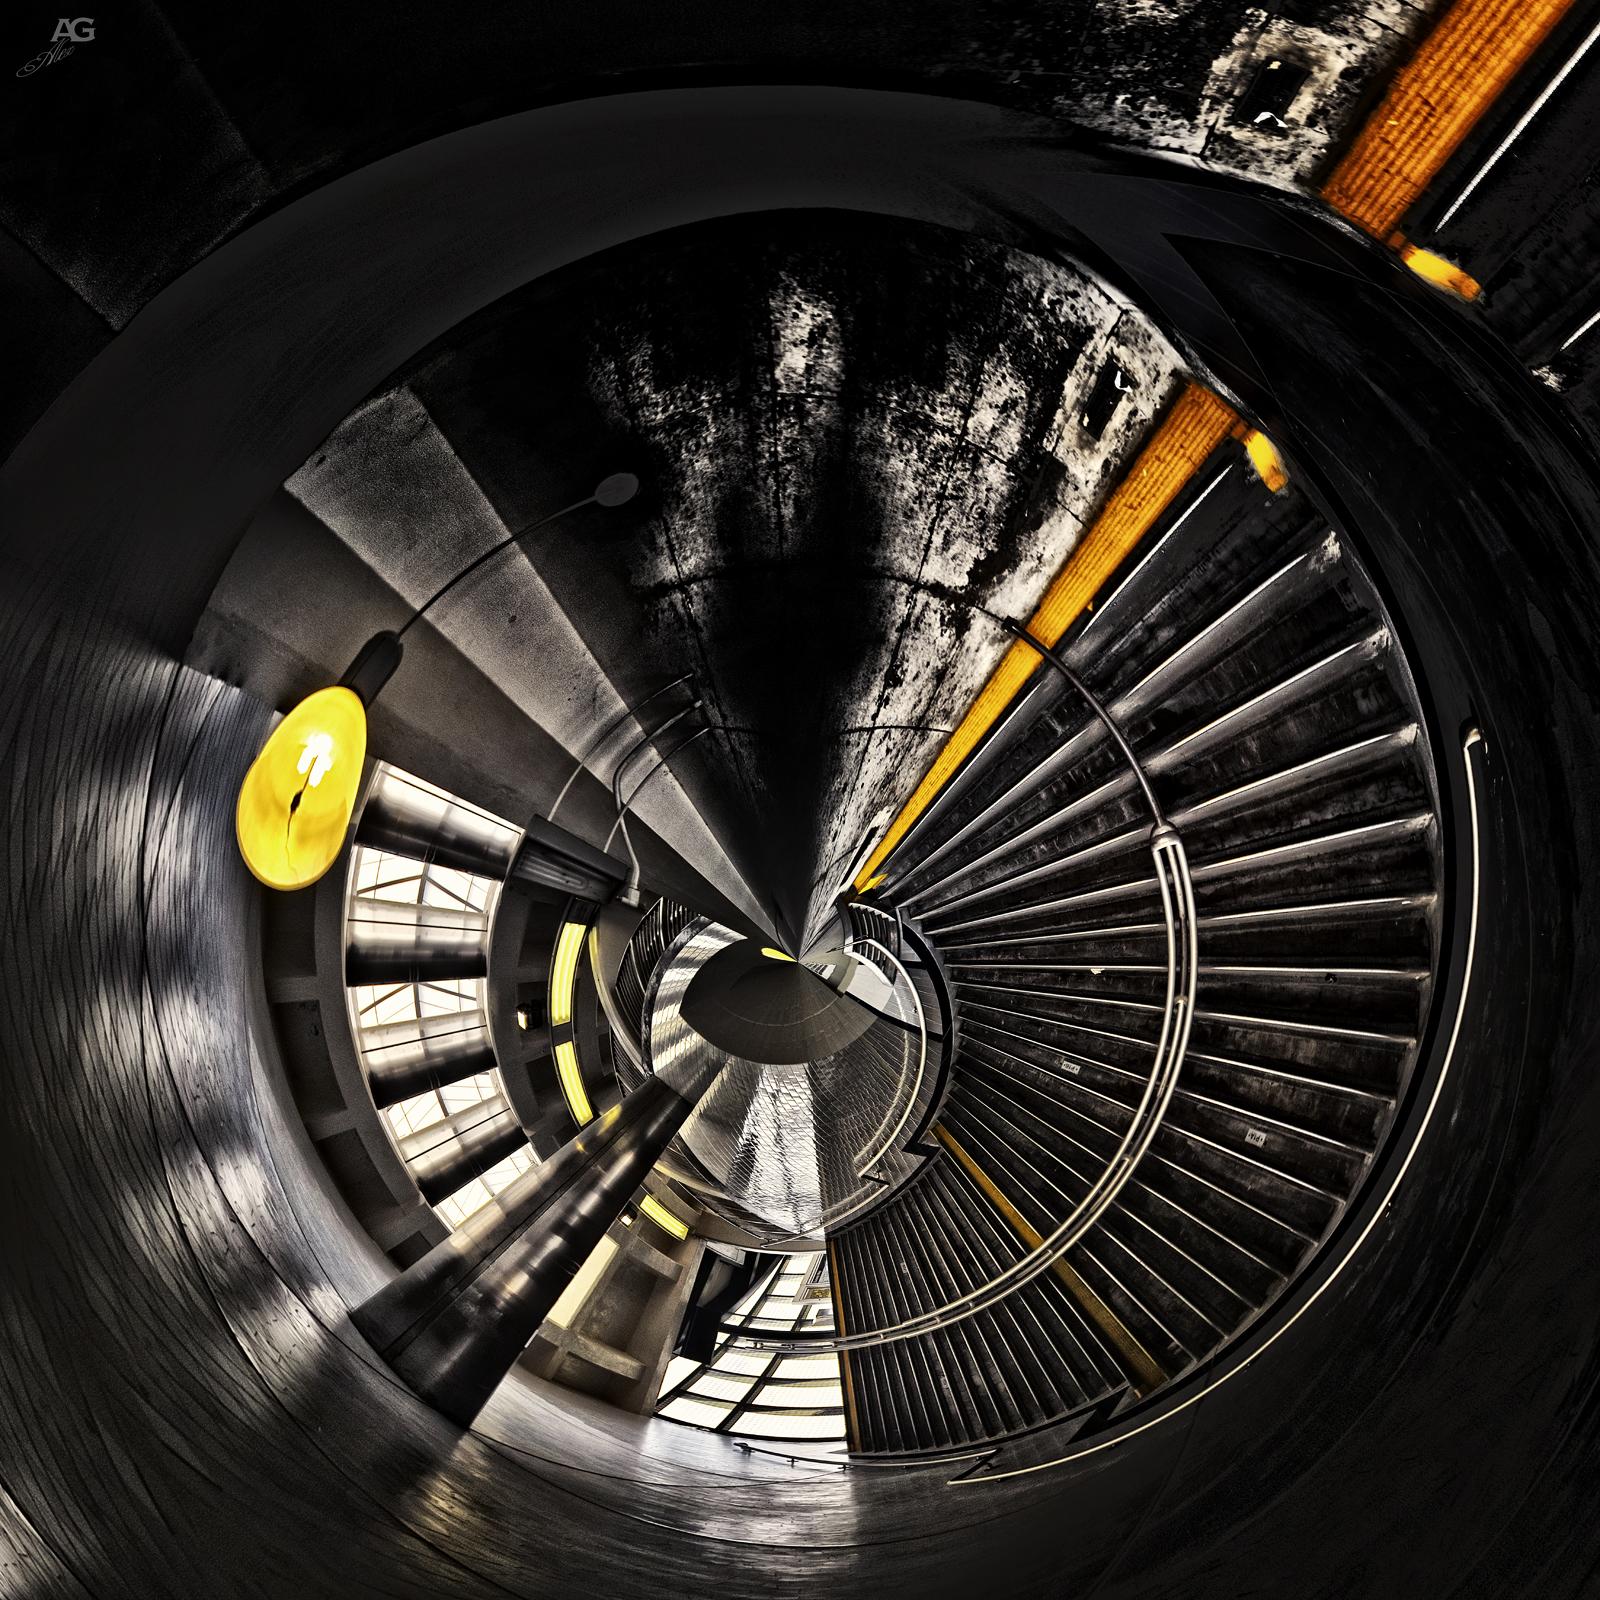 StairsOnTheSubwayTrainNeckRoadStationVertical_sigma_POLAR_1600 - Copy